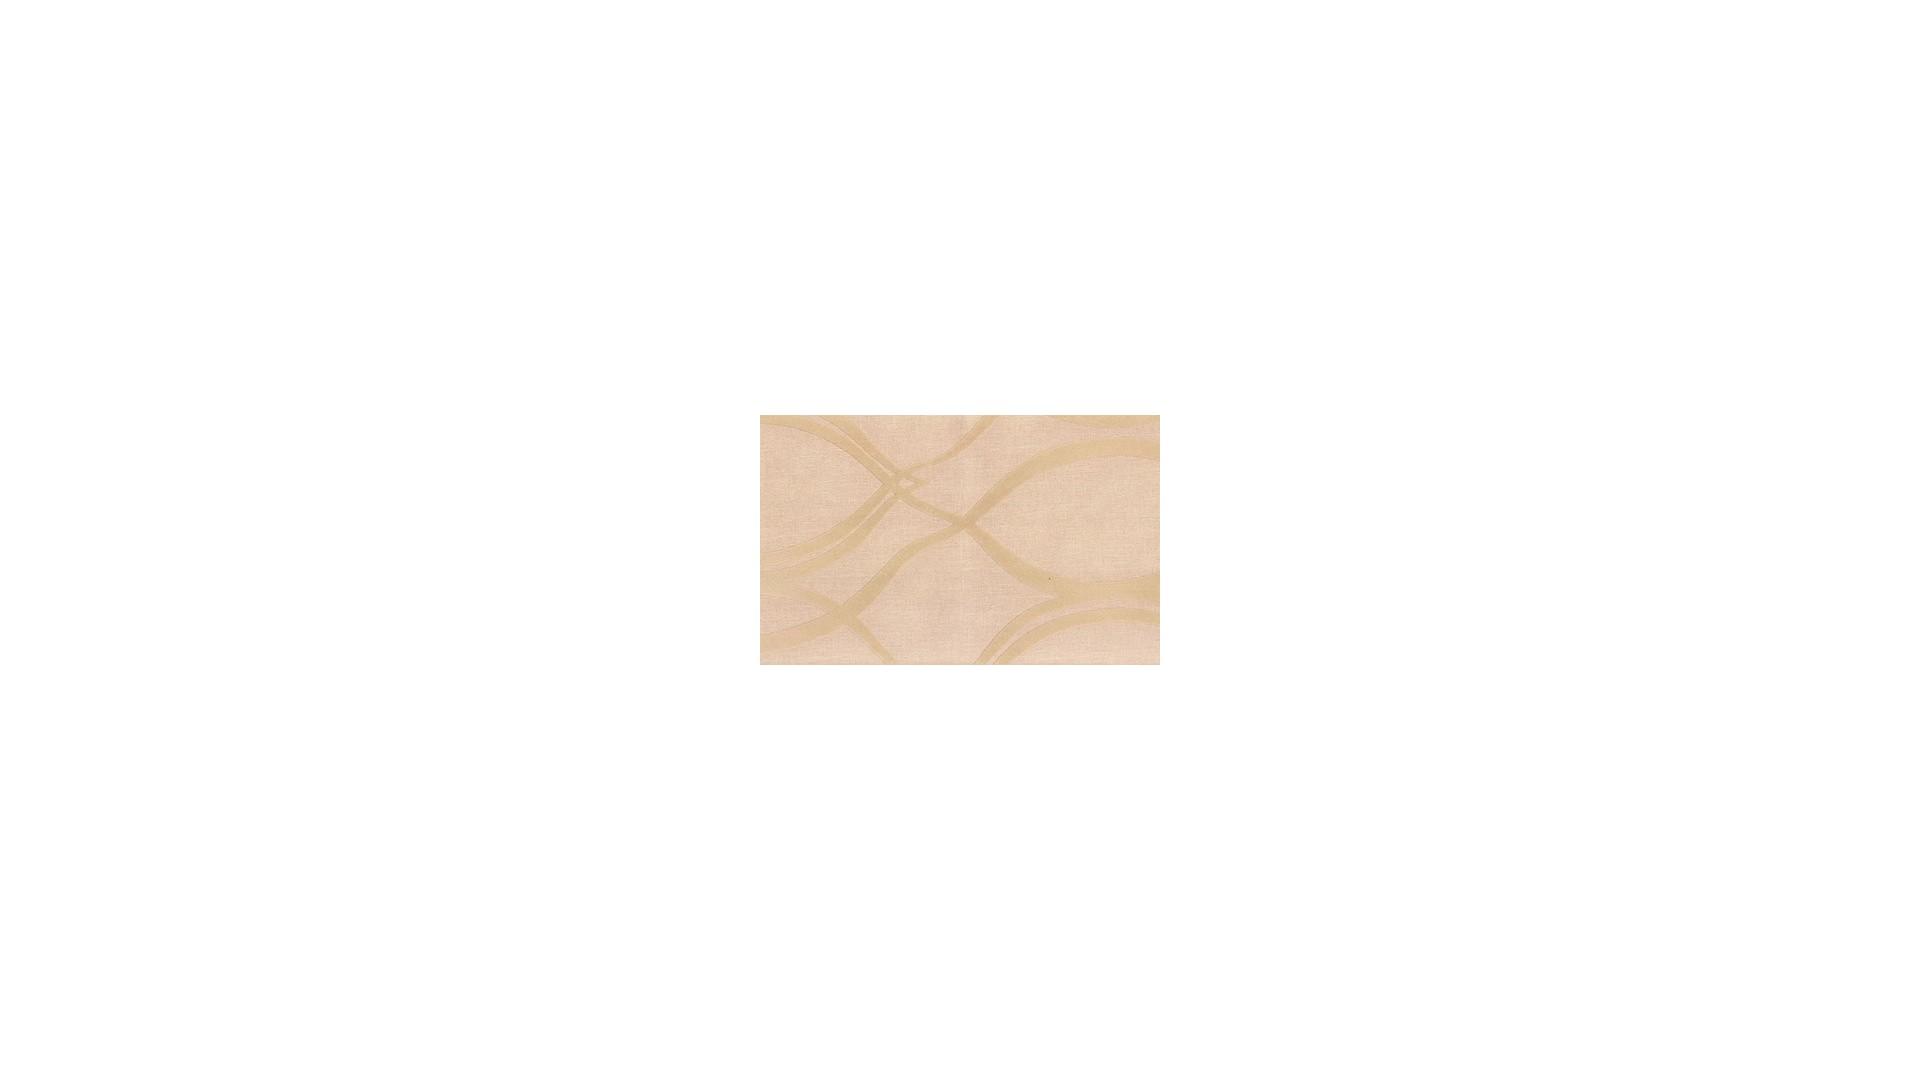 sofa glue band olx set delhi furio modern sim okrzos tkaniny obiciowe